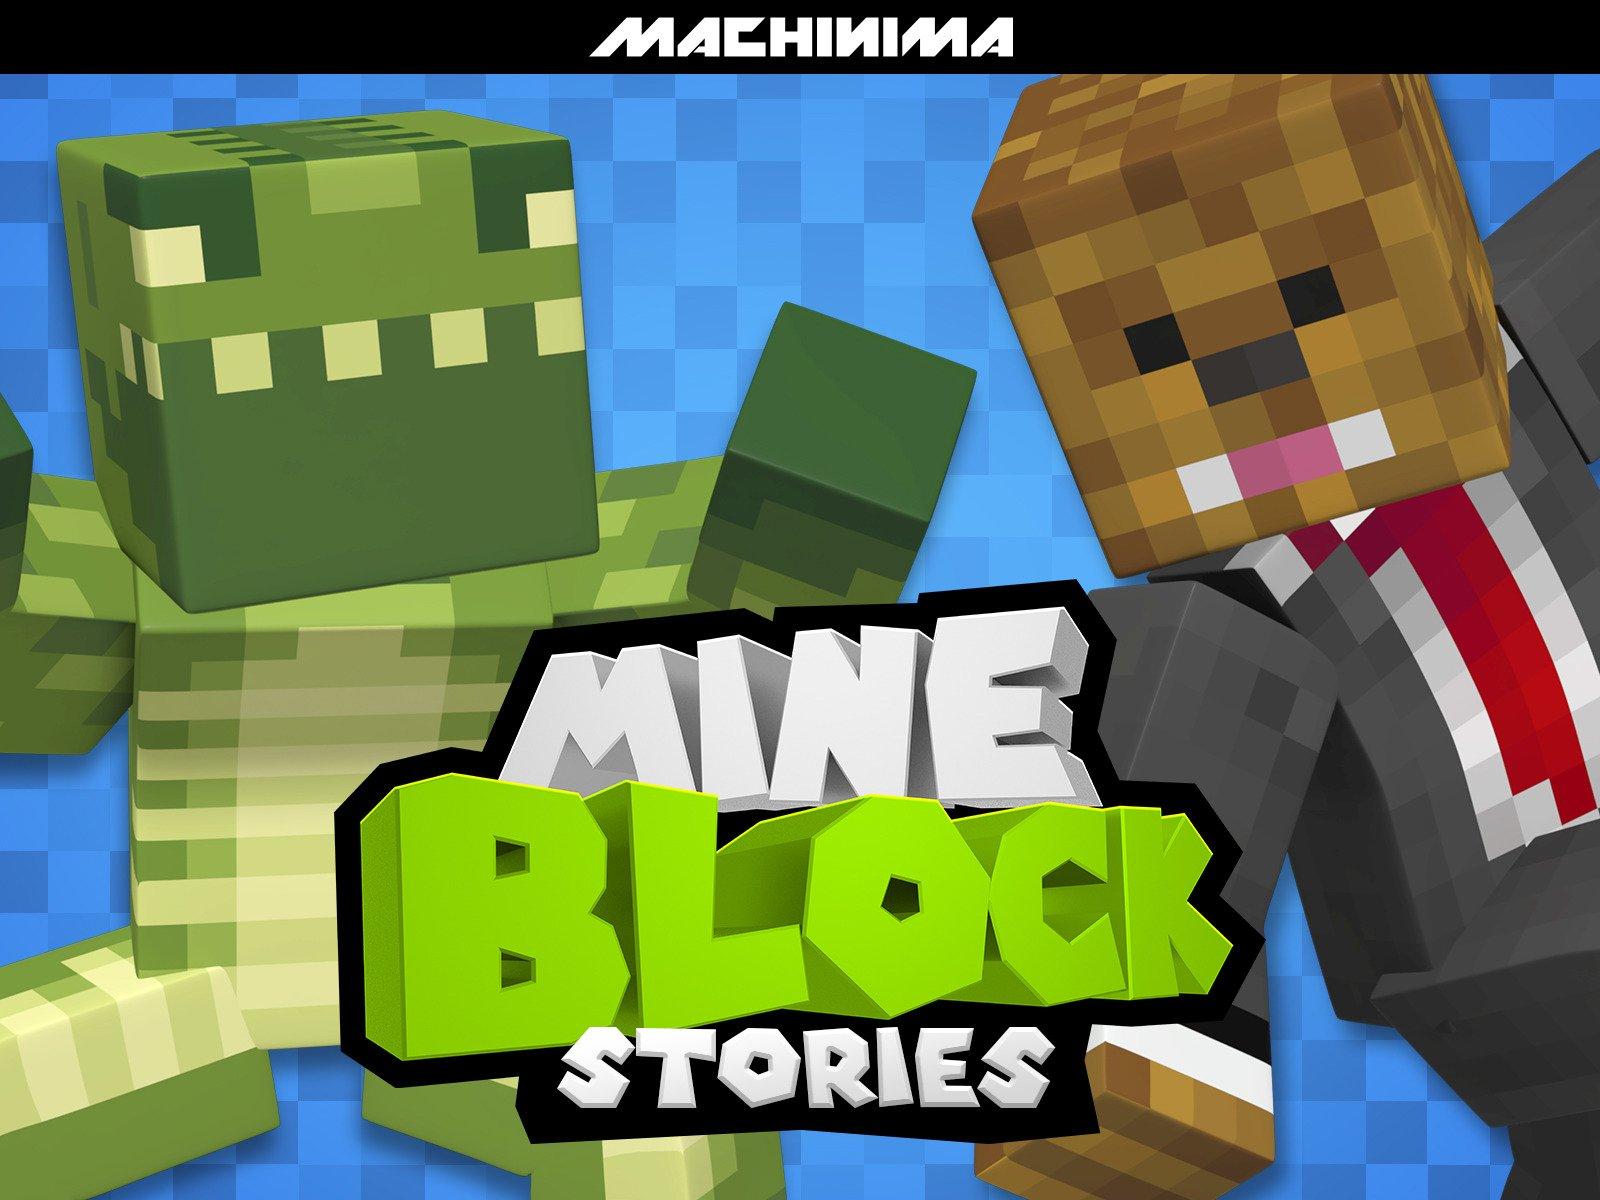 Clip: Mineblock:Stories on Amazon Prime Video UK